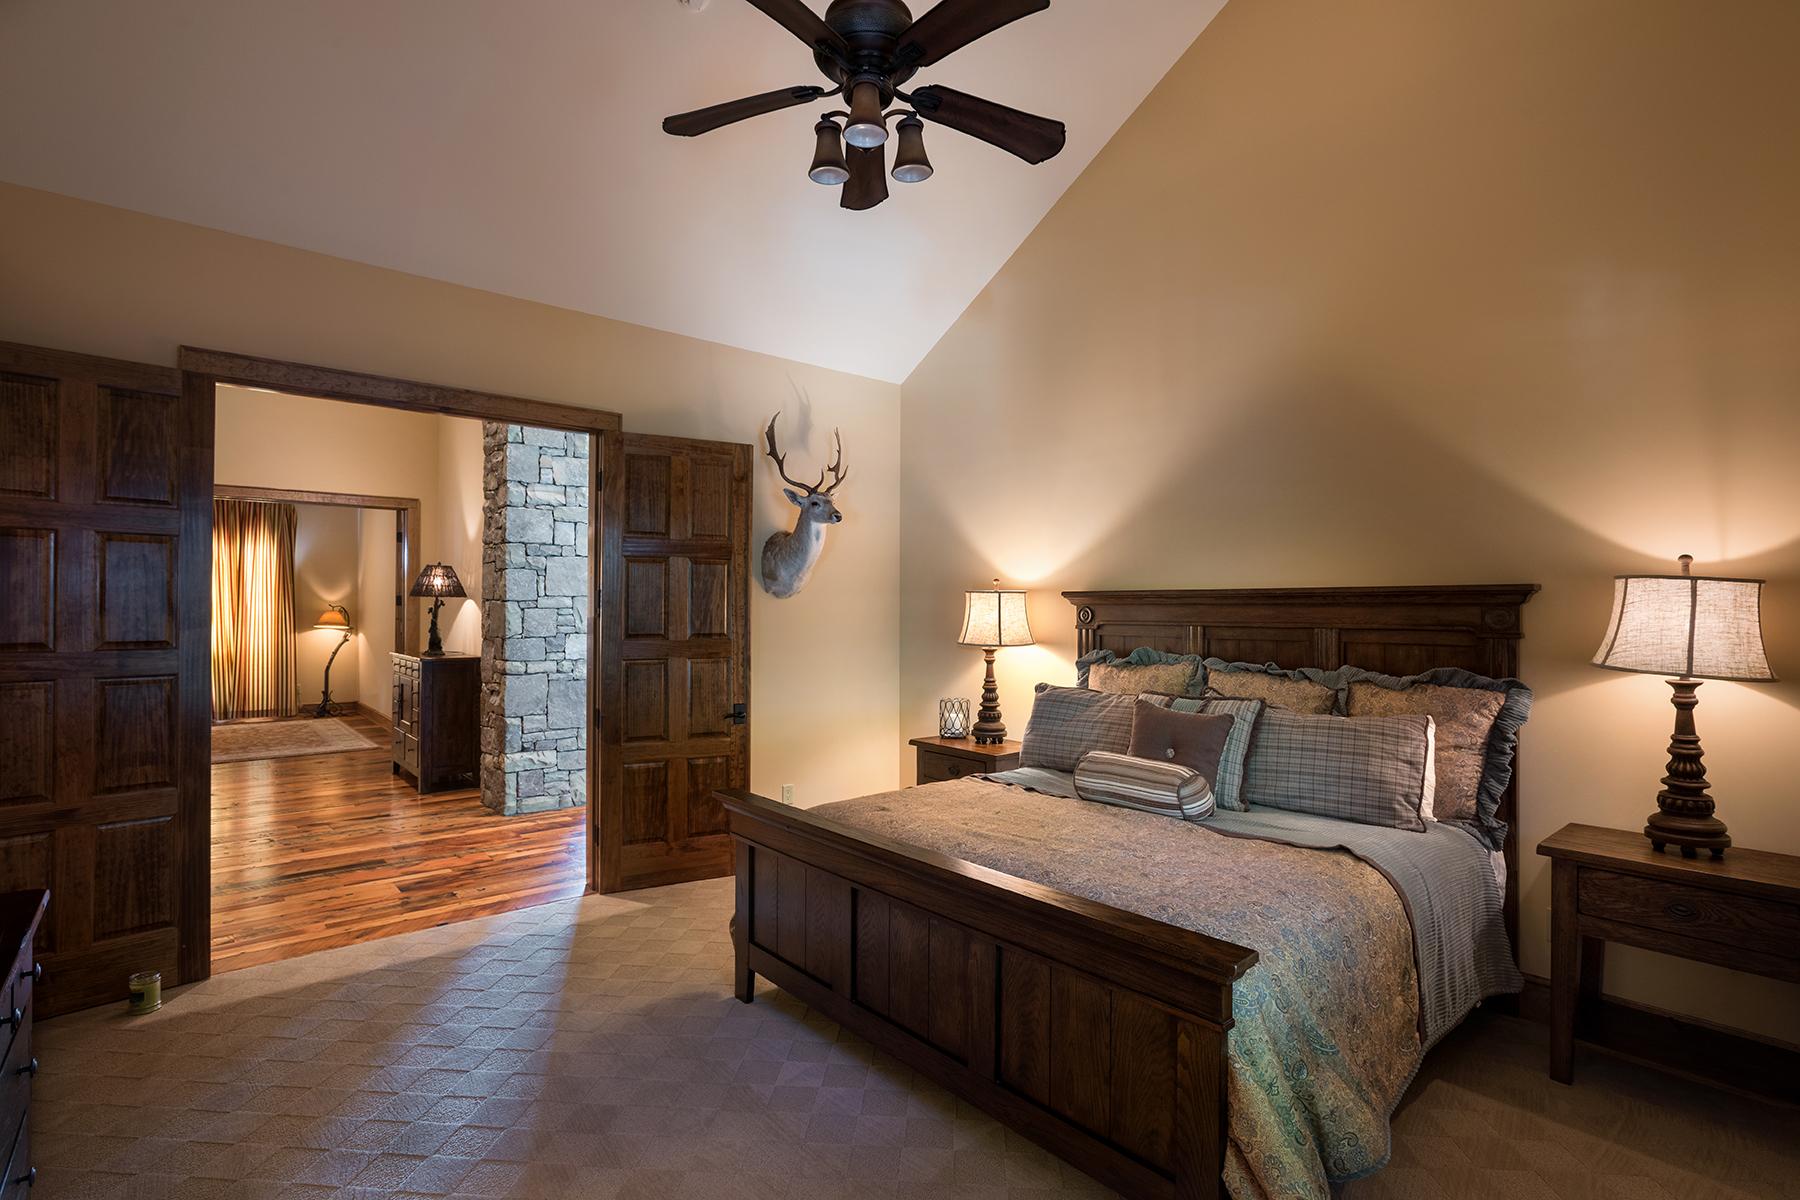 Additional photo for property listing at 1721 Forest Ridge Dr , Linville, NC 28646 1721  Forest Ridge Dr,  Linville, North Carolina 28646 United States